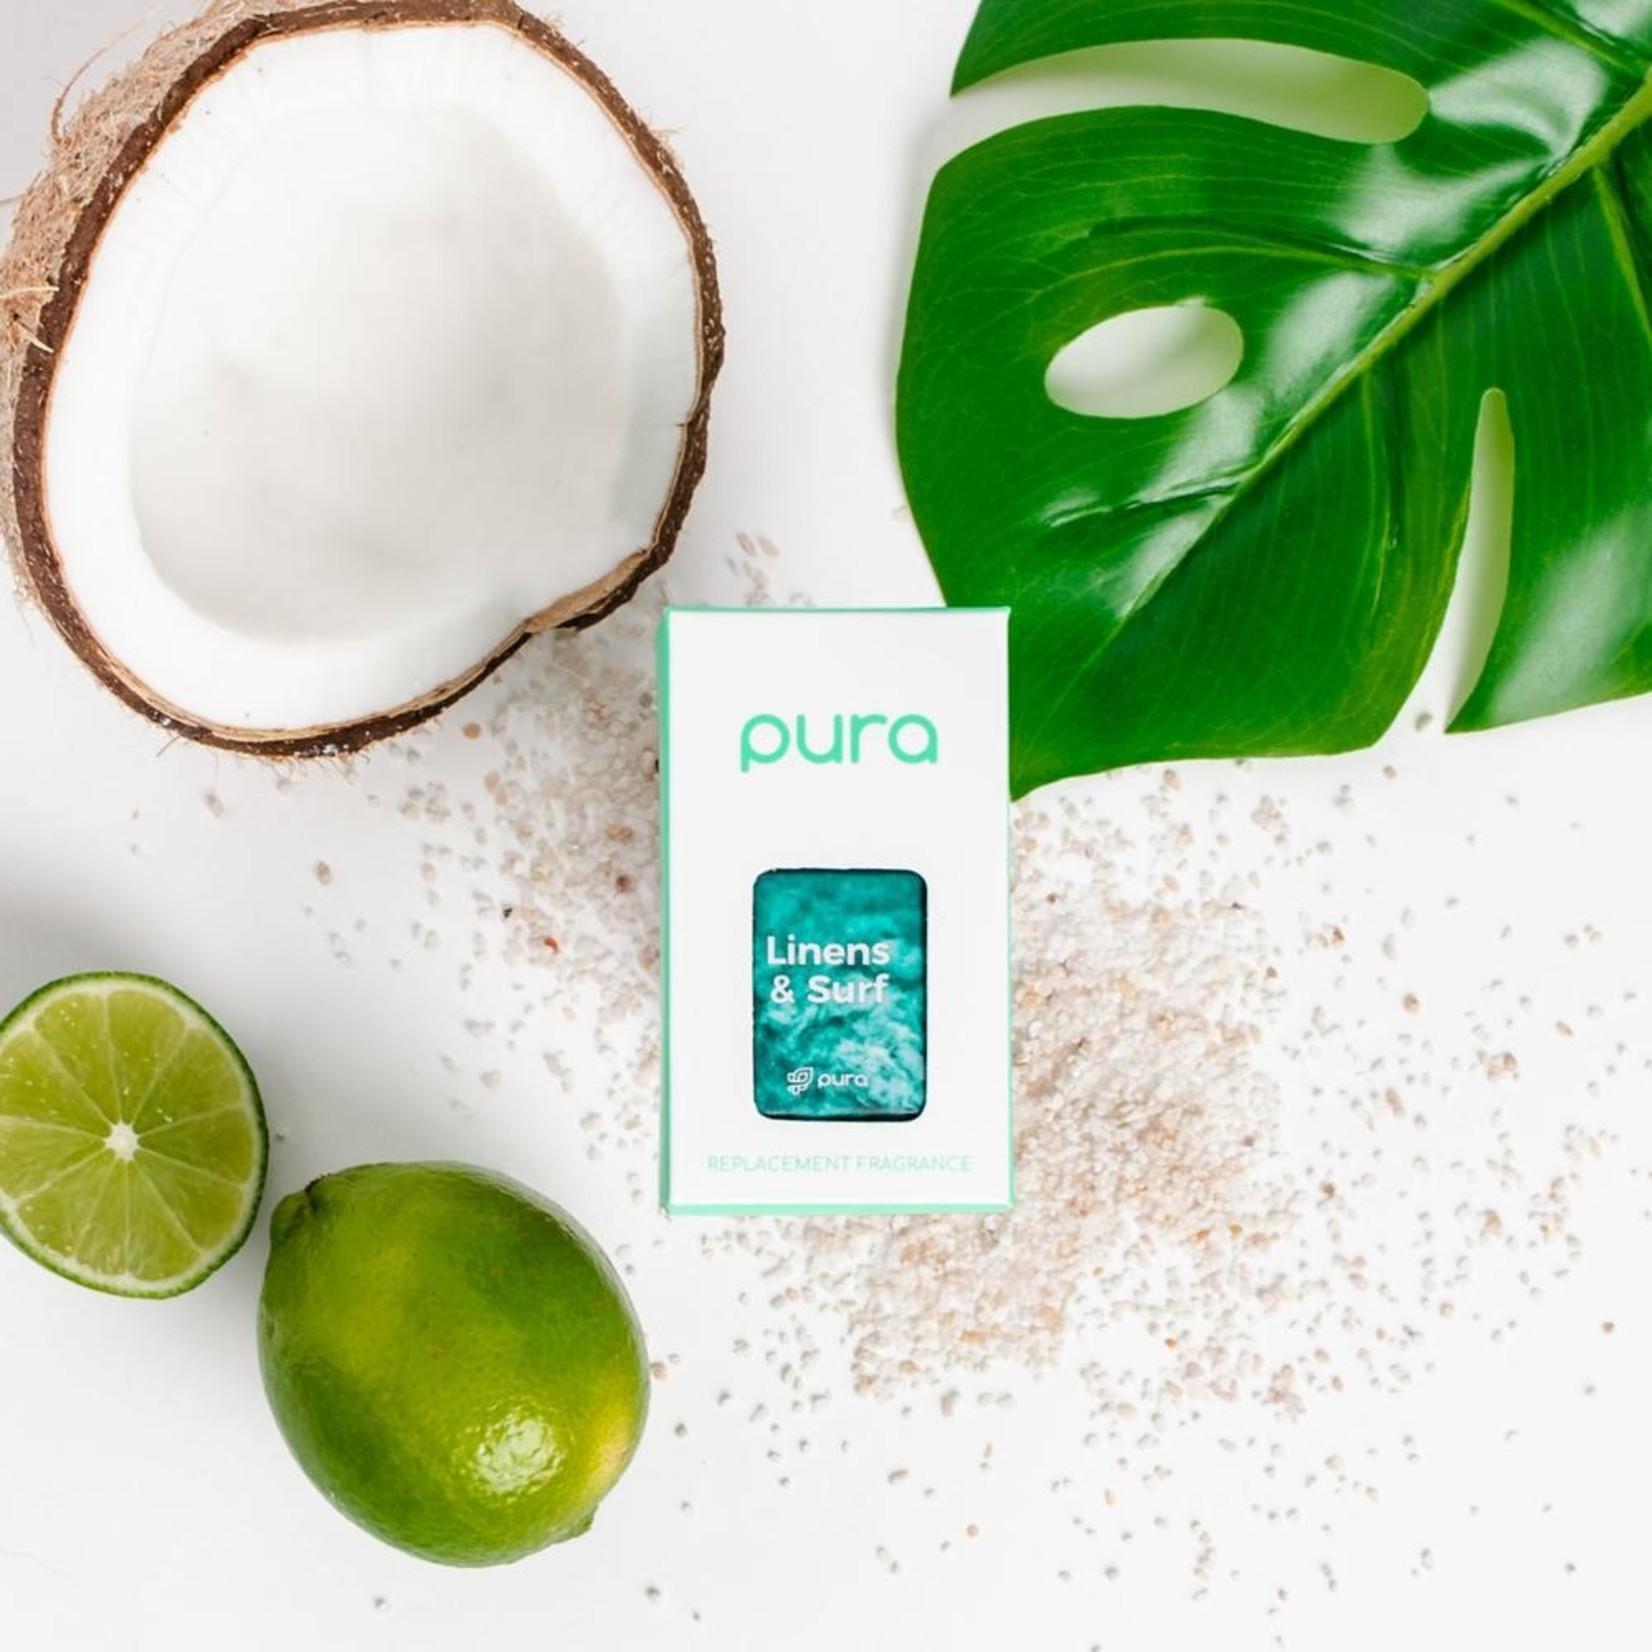 Pura Linens and Surf Pura Fragrance